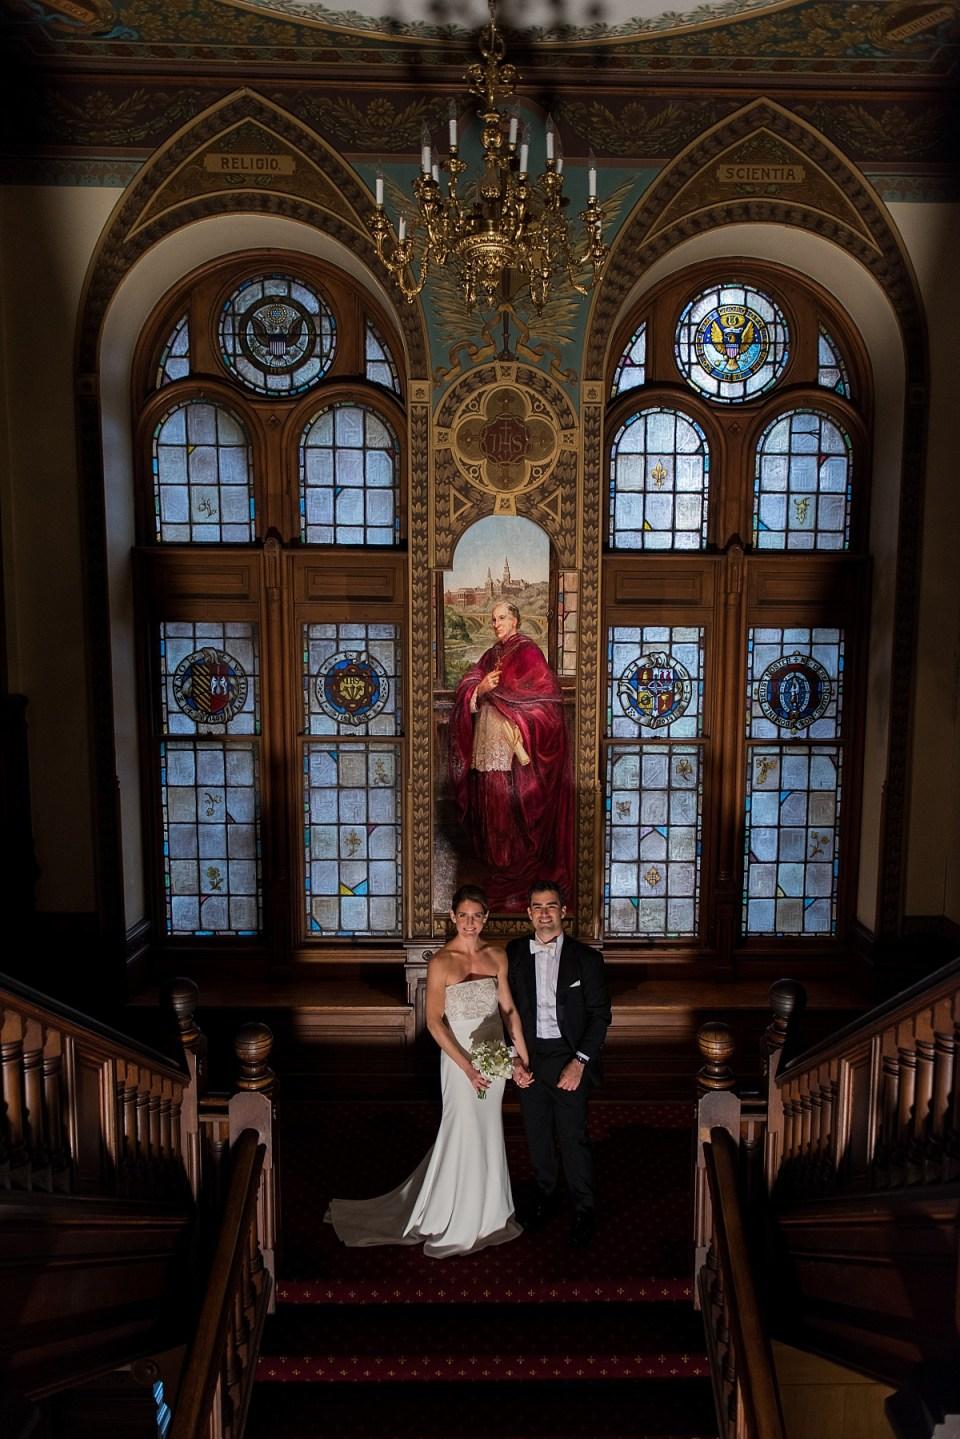 Wedding Photos inside Healy Hall